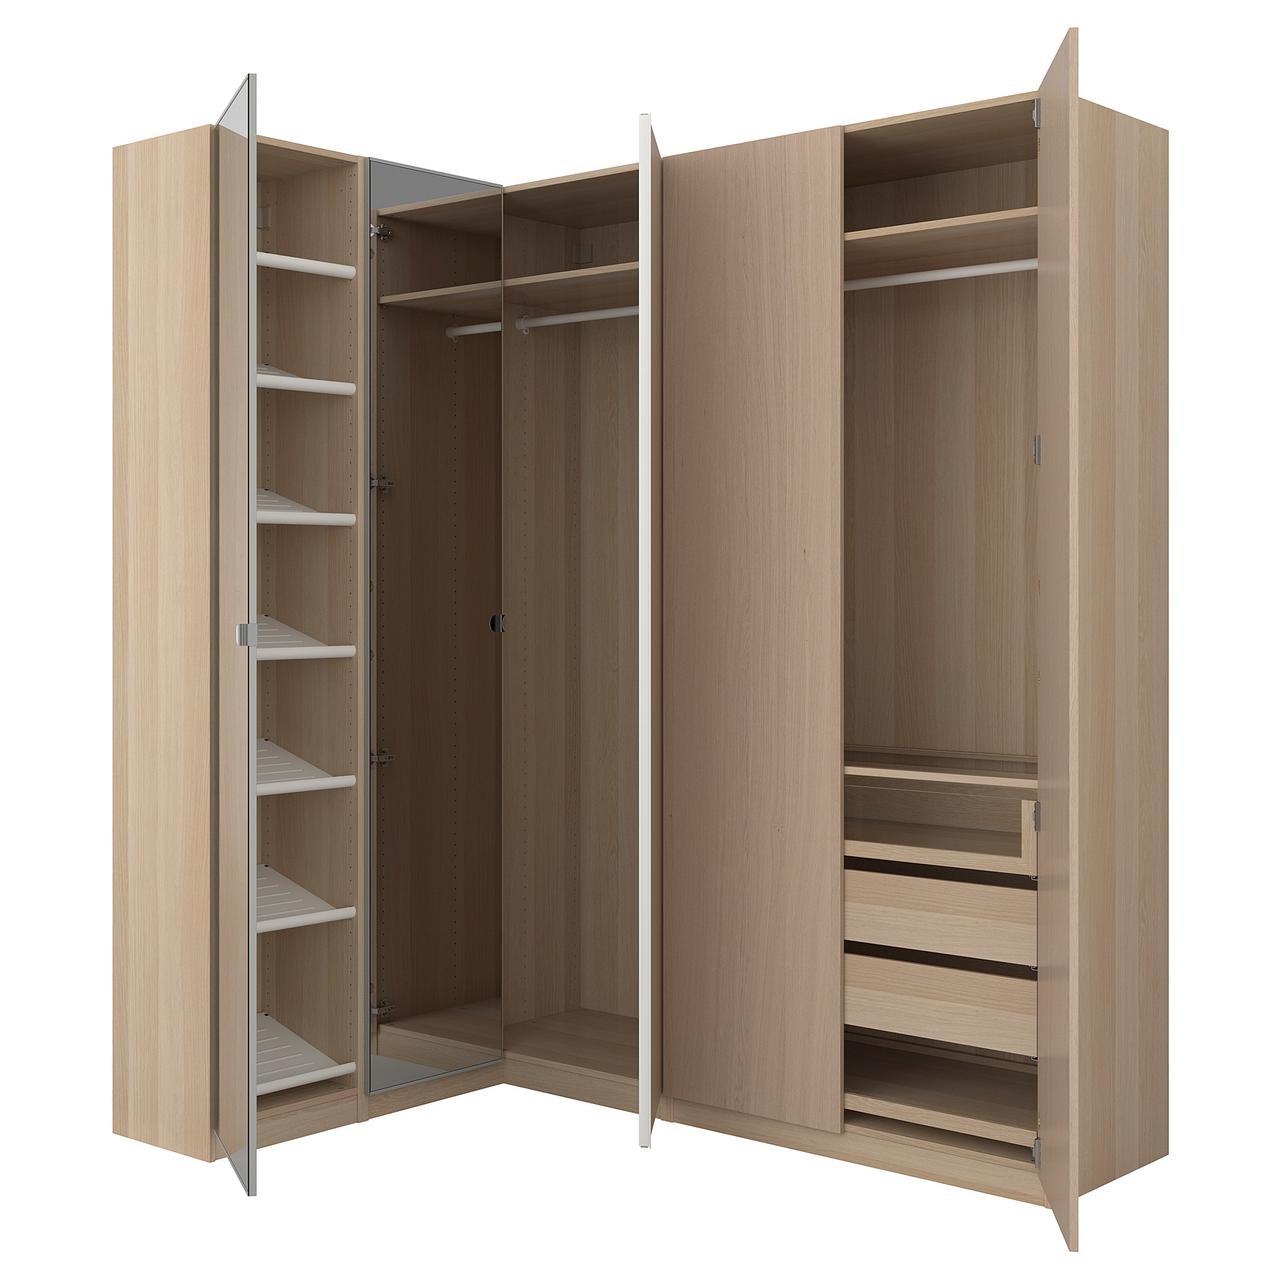 Угловой шкаф IKEA PAX 160/188x236 см Nexus Vikedal беленый дуб с зеркалом 292.179.33